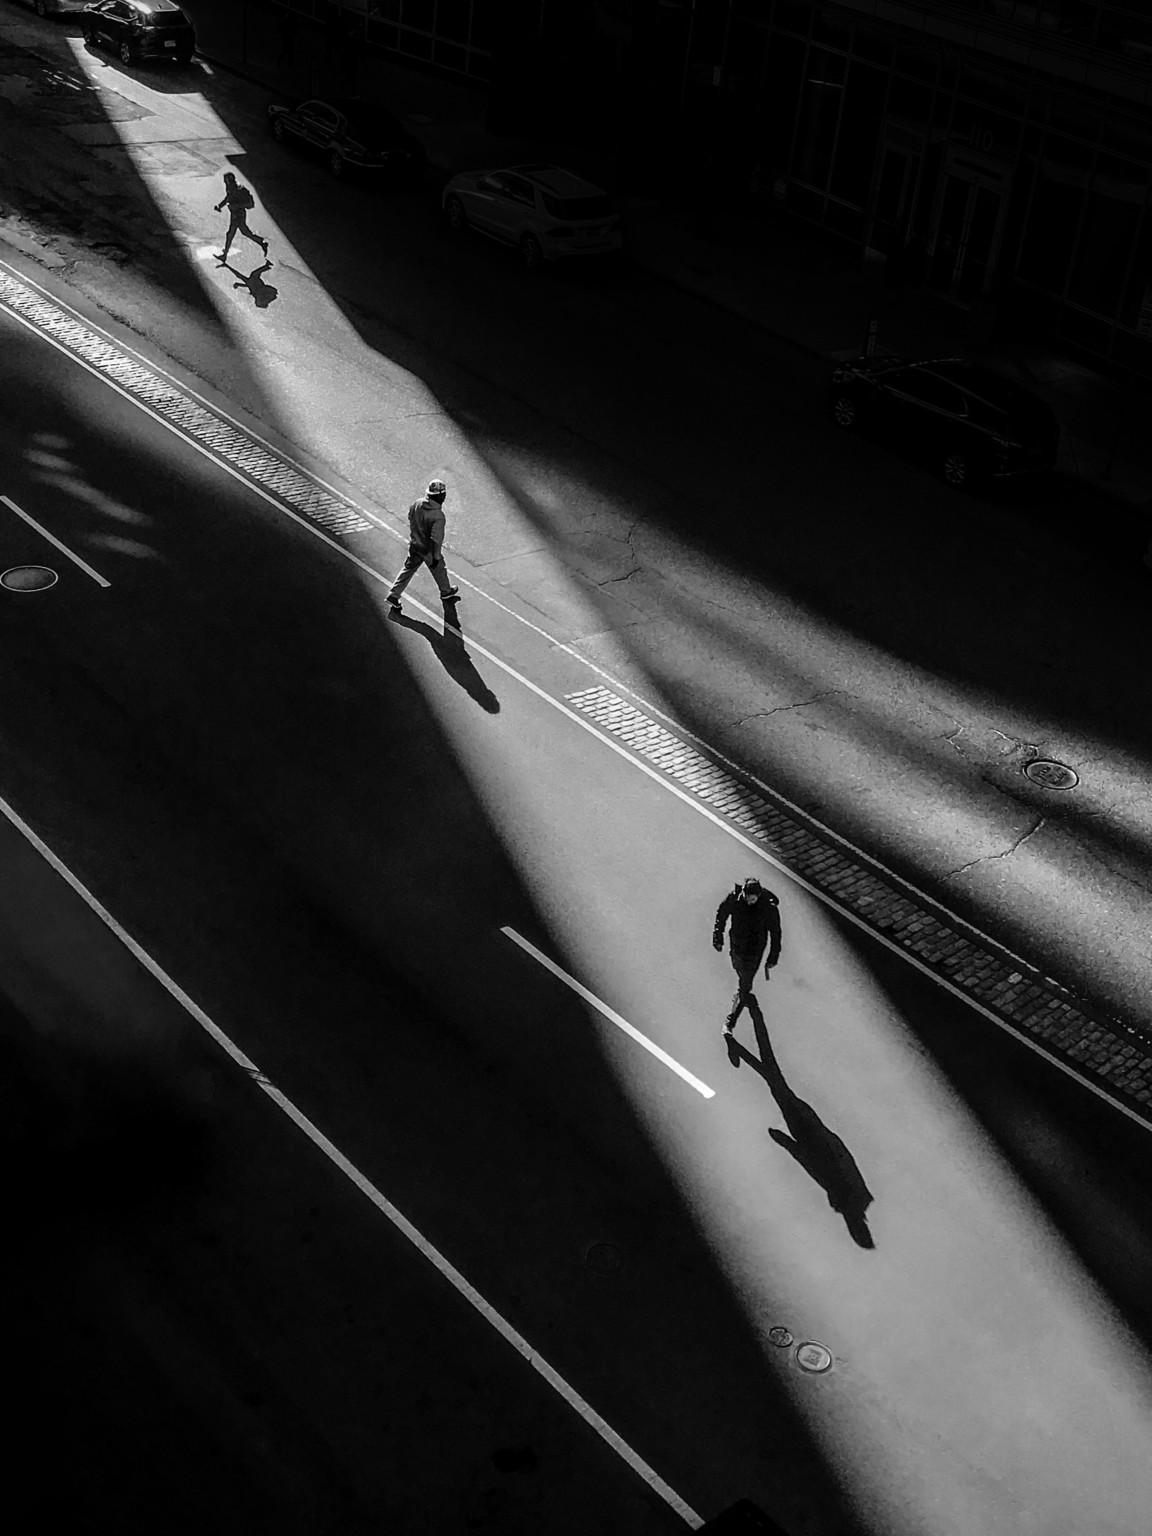 foto vencedora do Mobile Photography Awards